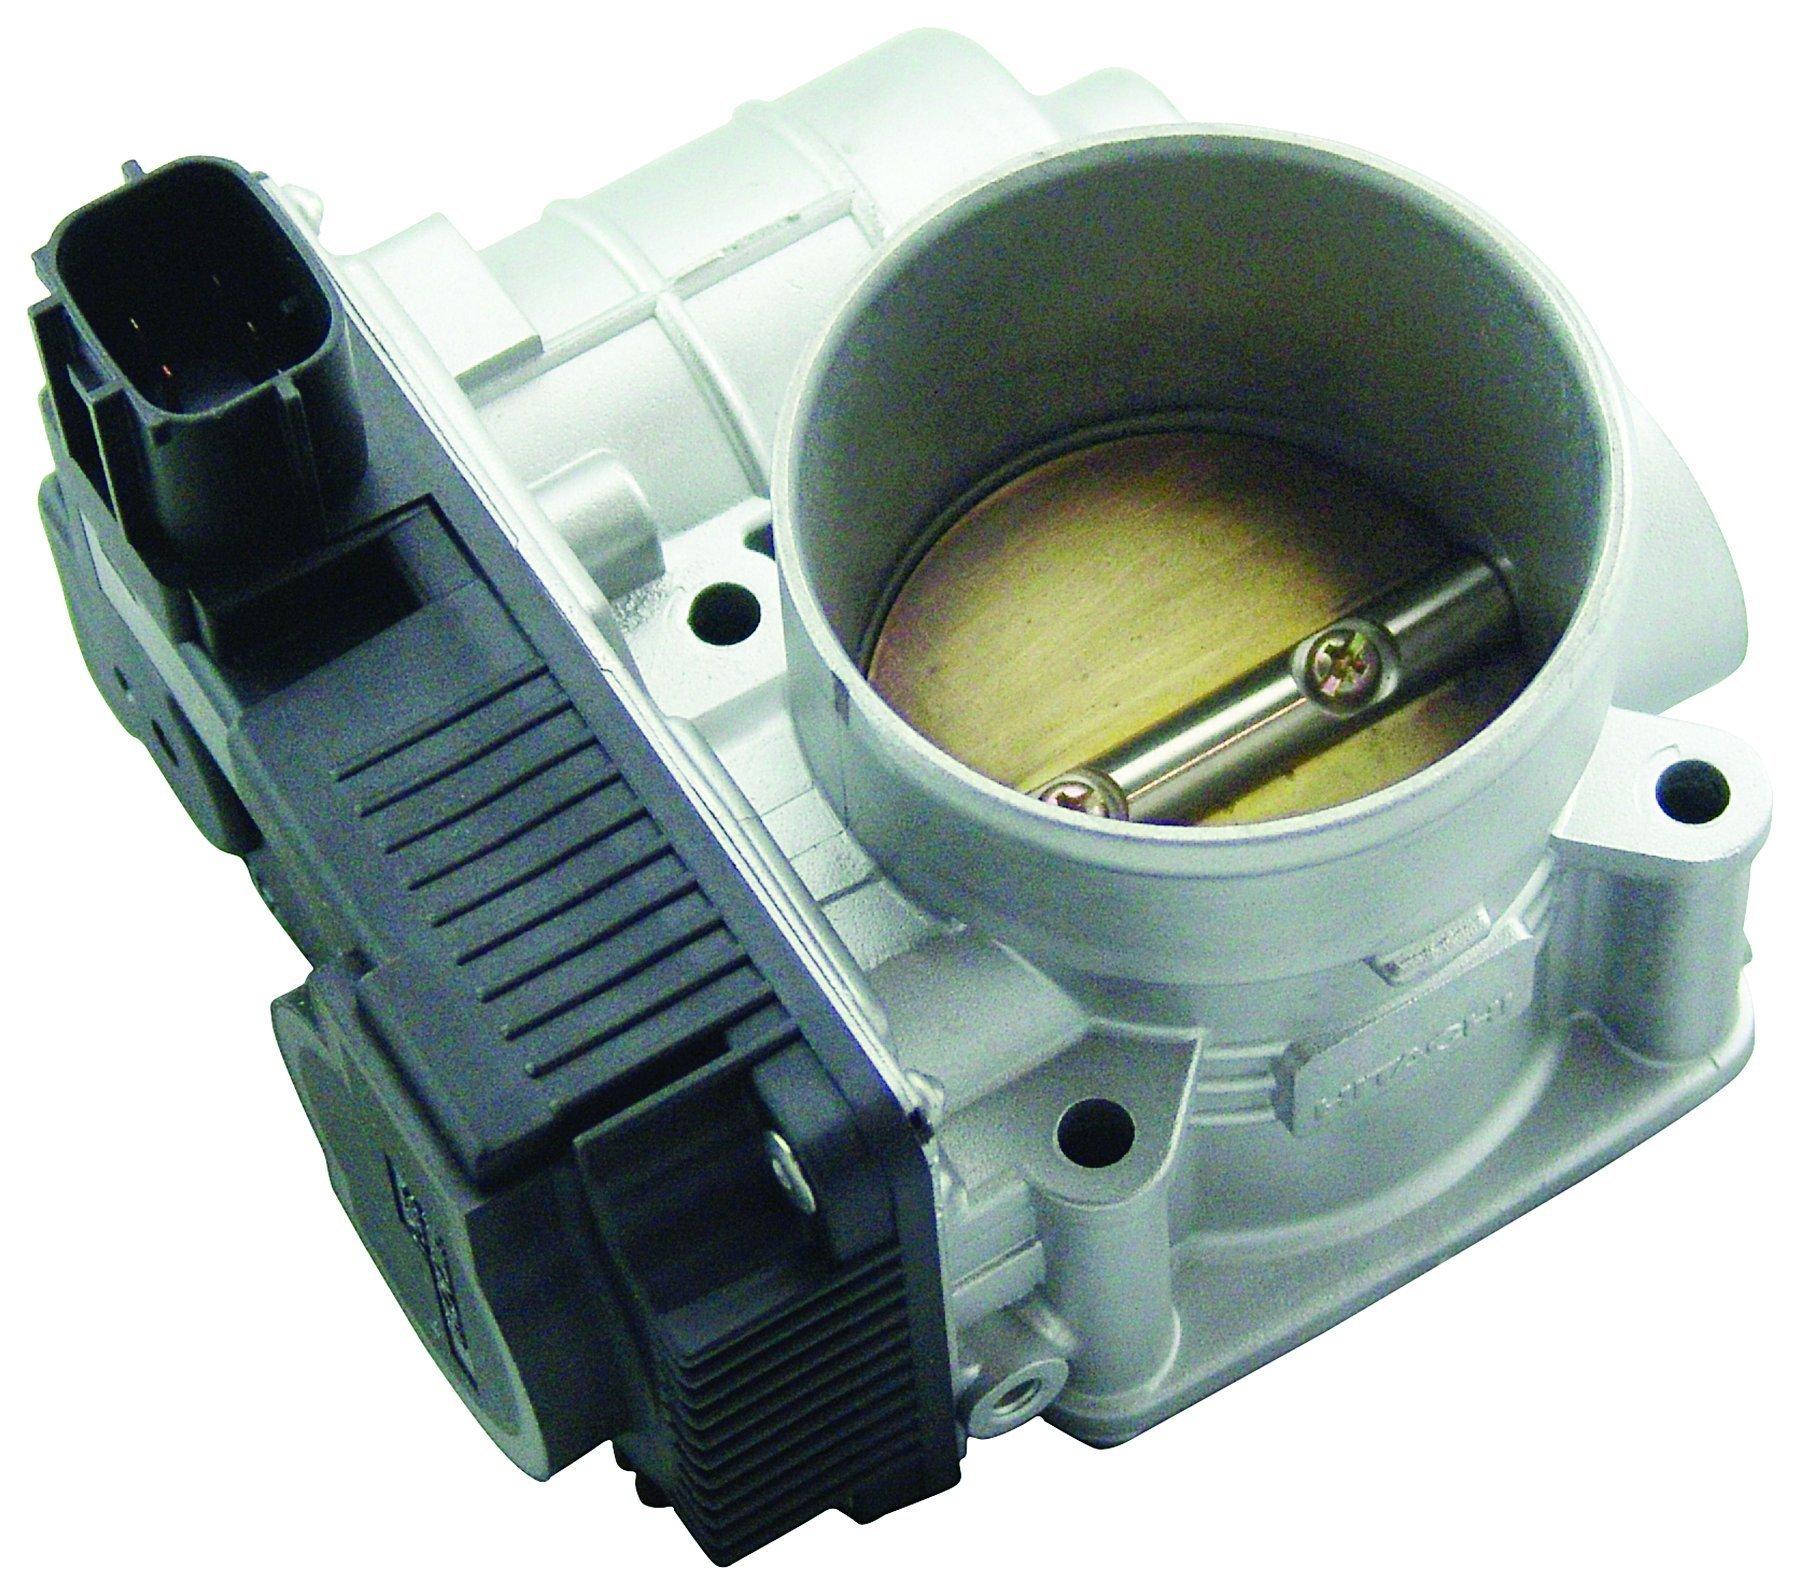 Hitachi ETB0003 Throttle Body (Certified Refurbished)